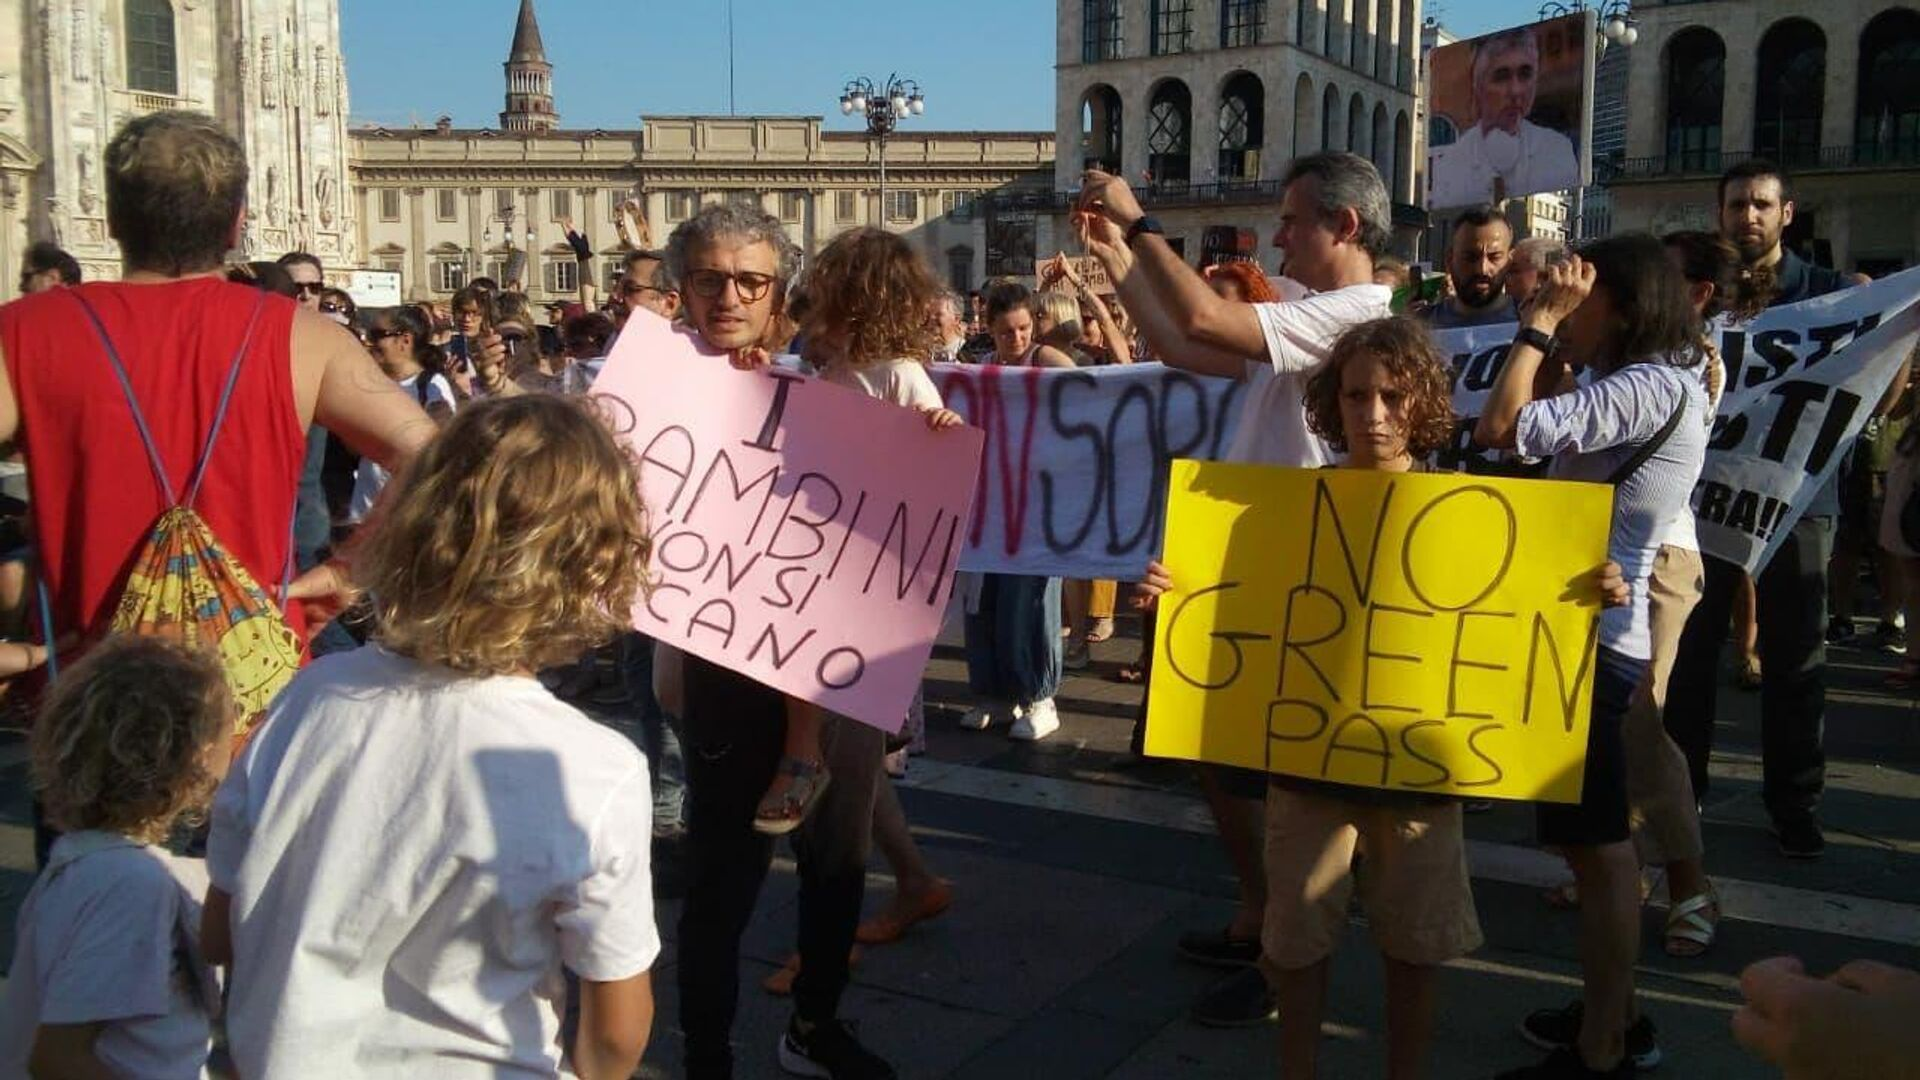 Manifestazione no Green pass a Milano  - Sputnik Italia, 1920, 28.08.2021